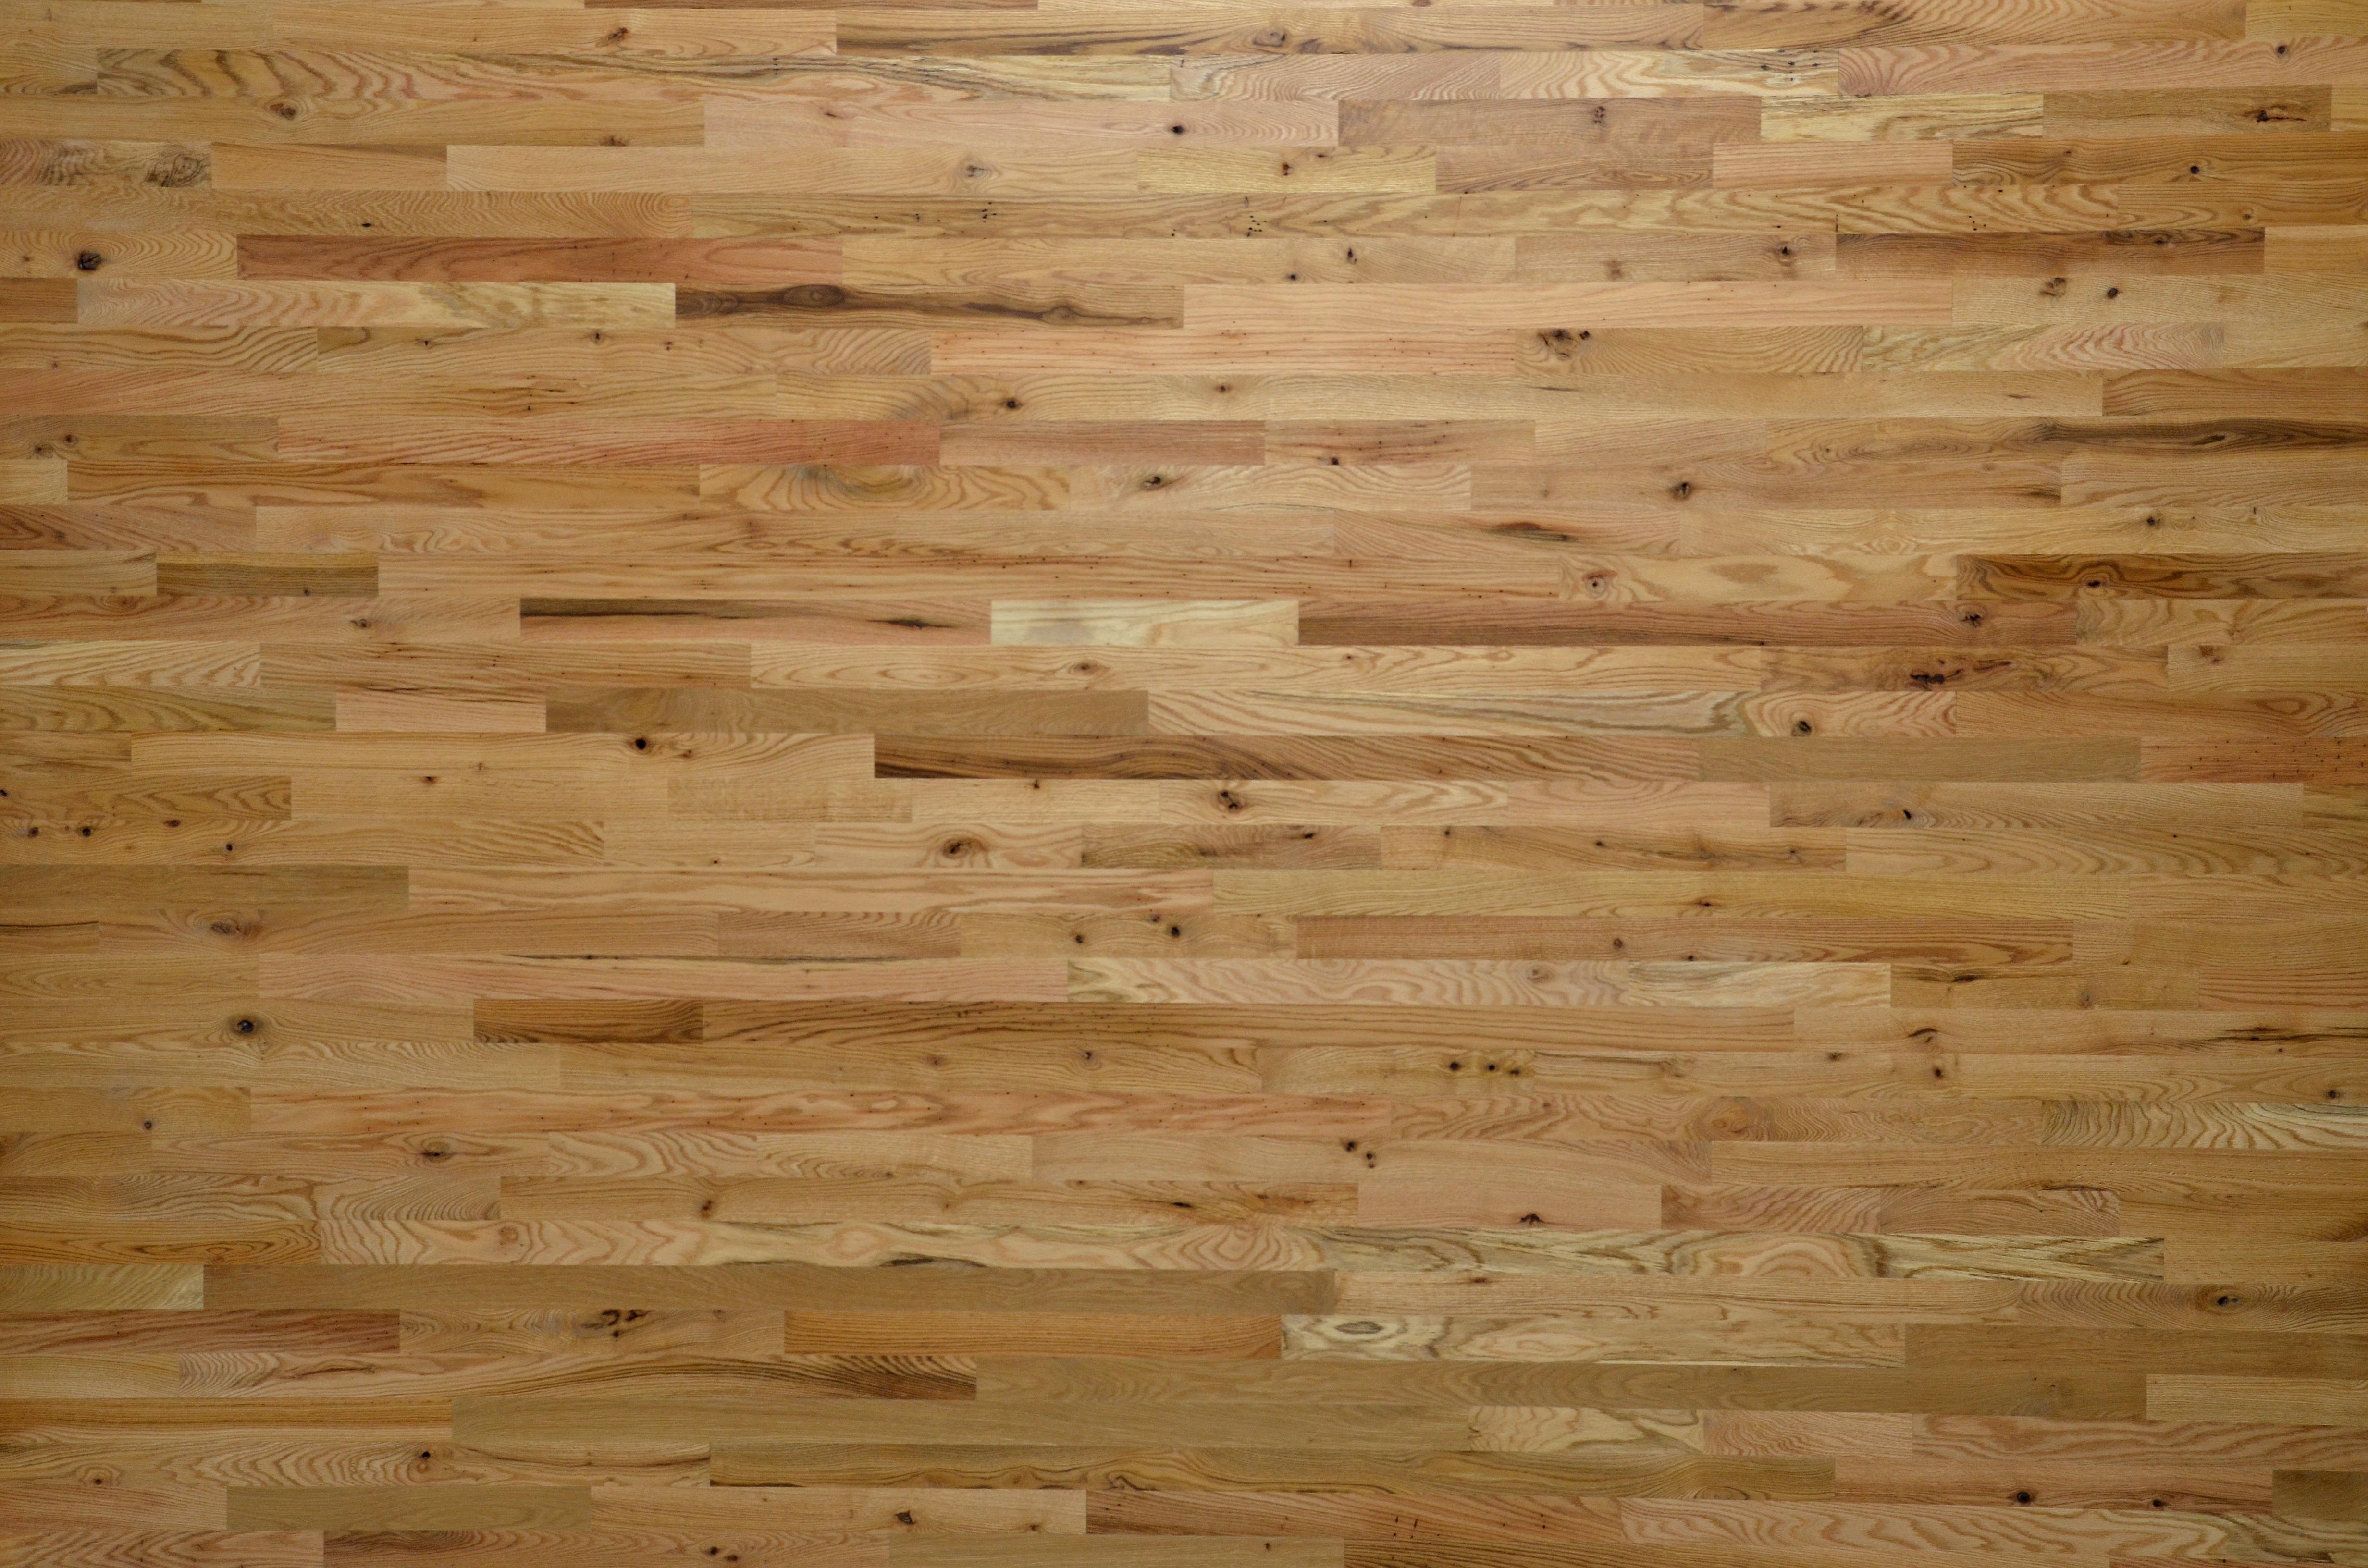 hardwood floor installation atlanta of lacrosse hardwood flooring walnut white oak red oak hickory with 2 common red oak